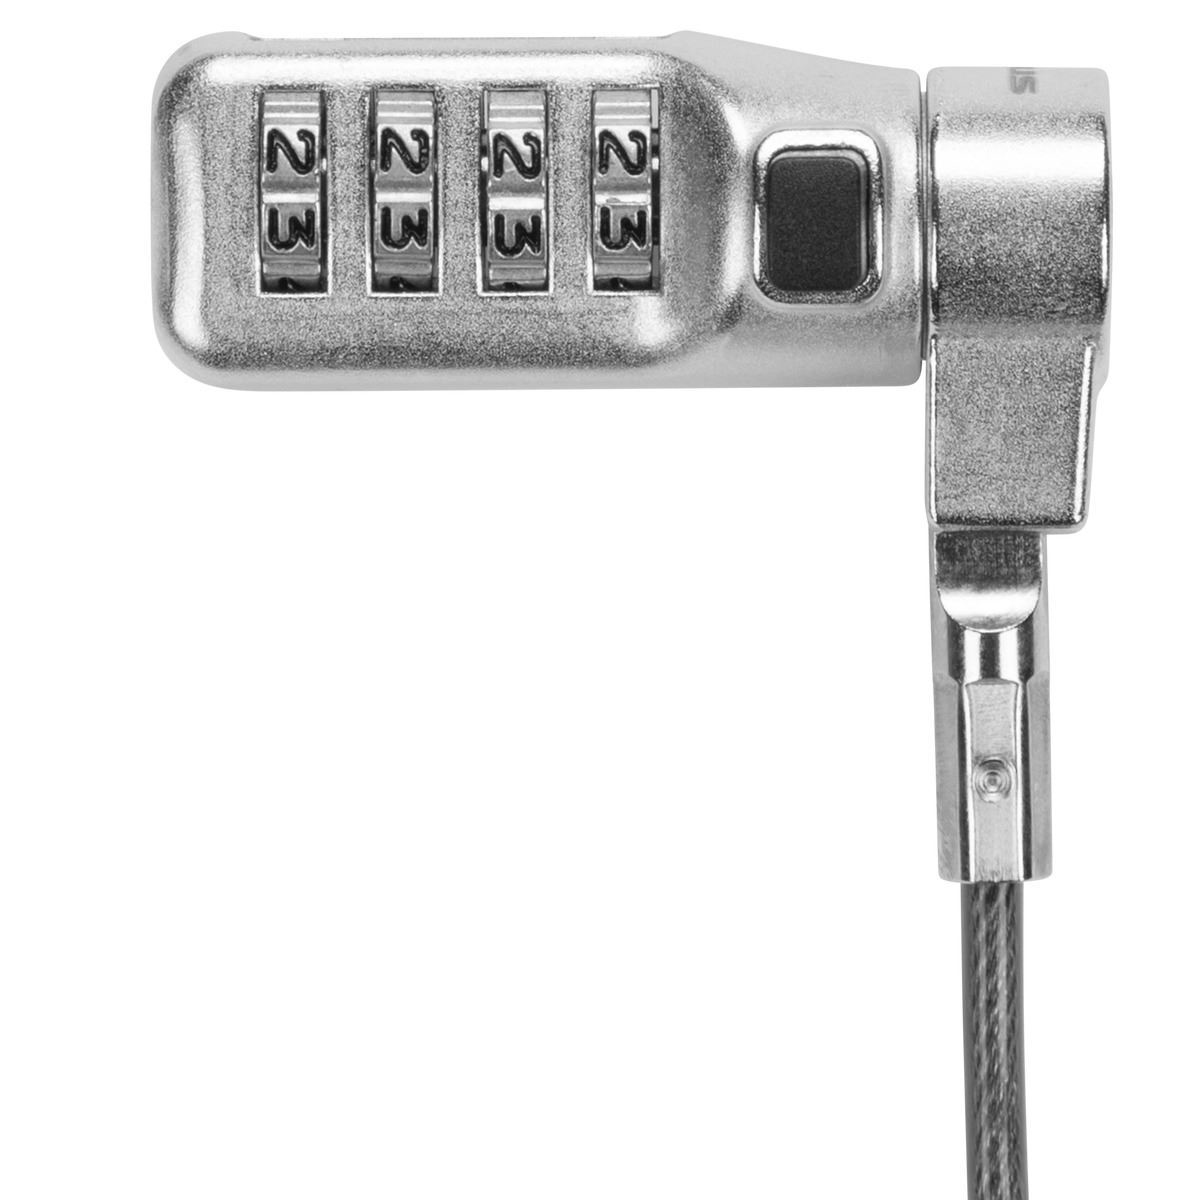 ASP86CCLGL 3-in-1 Lock Coiled Combination Lock